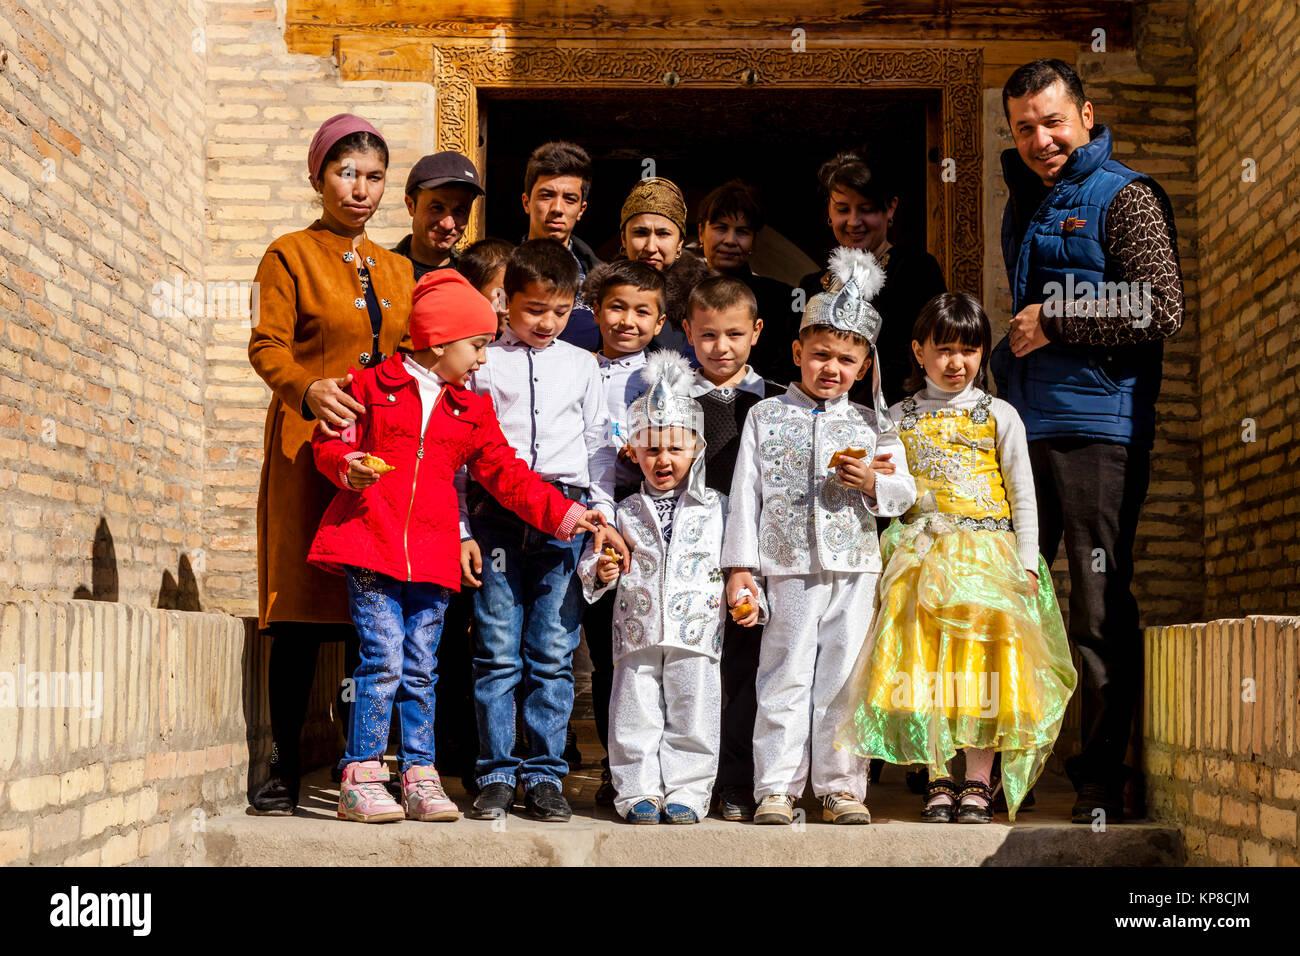 Uzbek Children Dressed In Traditional Costume Visit The Pahlavan Mahmud Mausoleum, Khiva, Uzbekistan - Stock Image